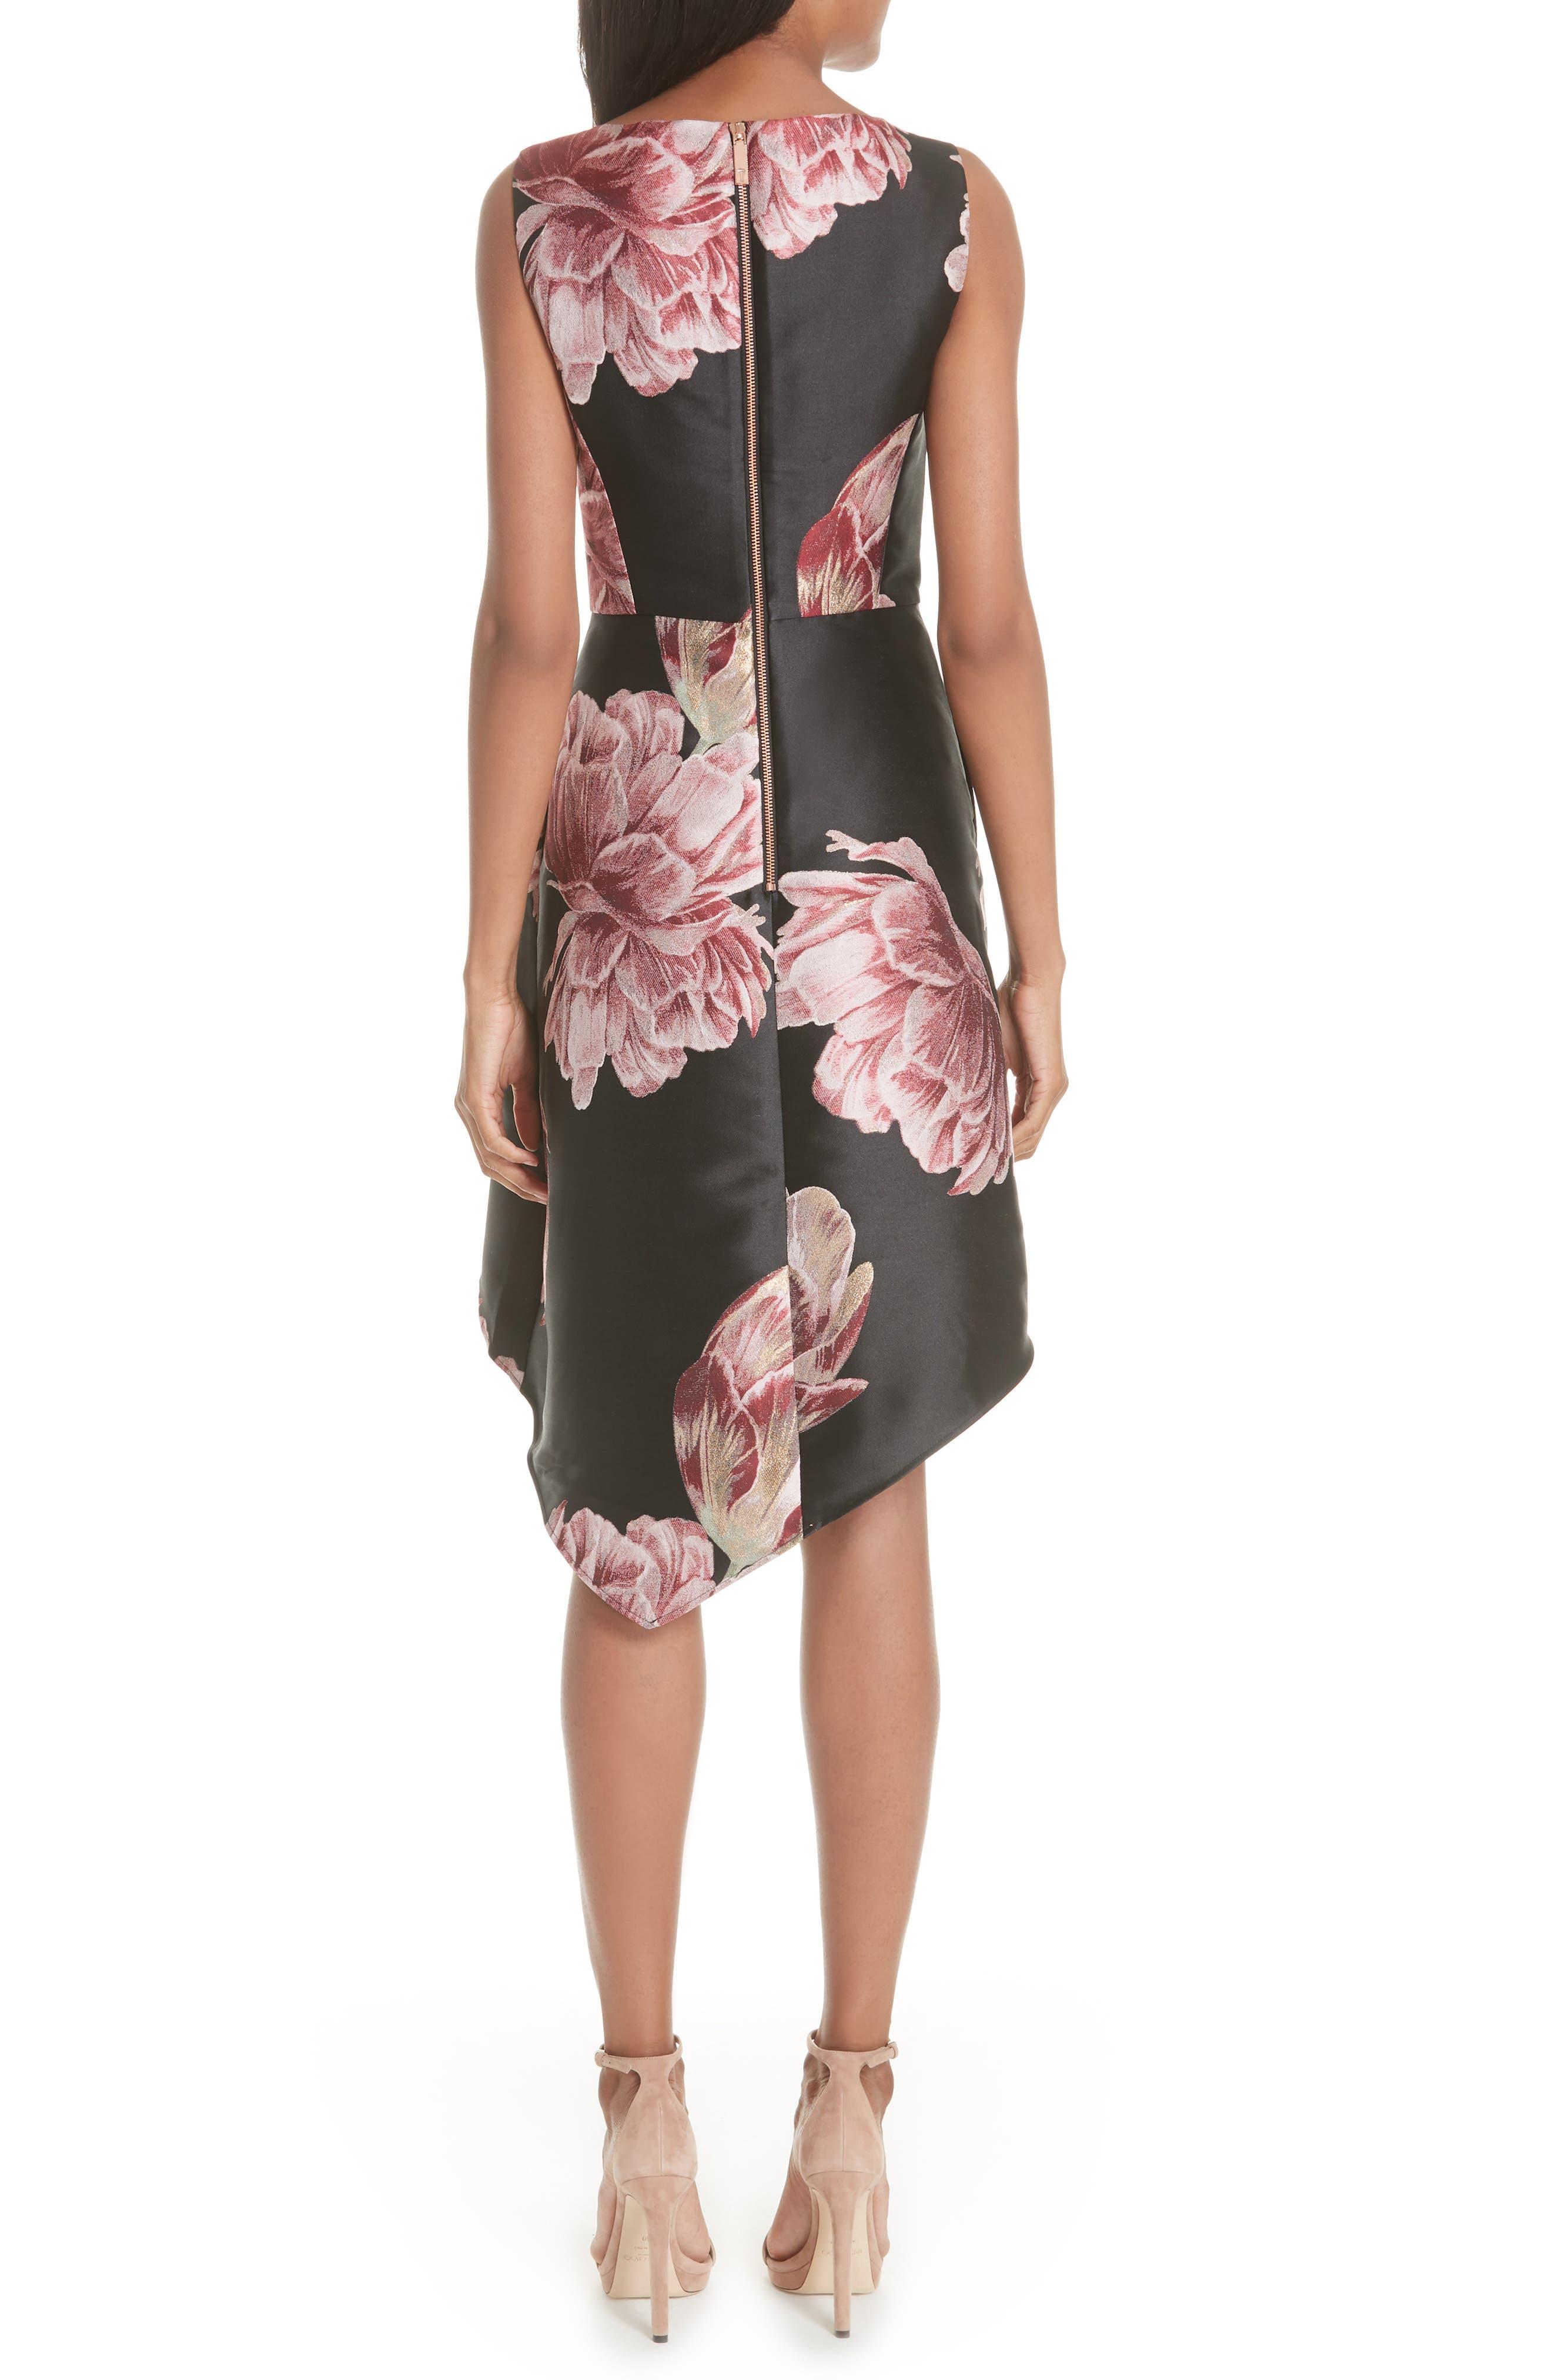 Eyvii Bay of Honour Asymmetrical Dress,                             Alternate thumbnail 2, color,                             Black